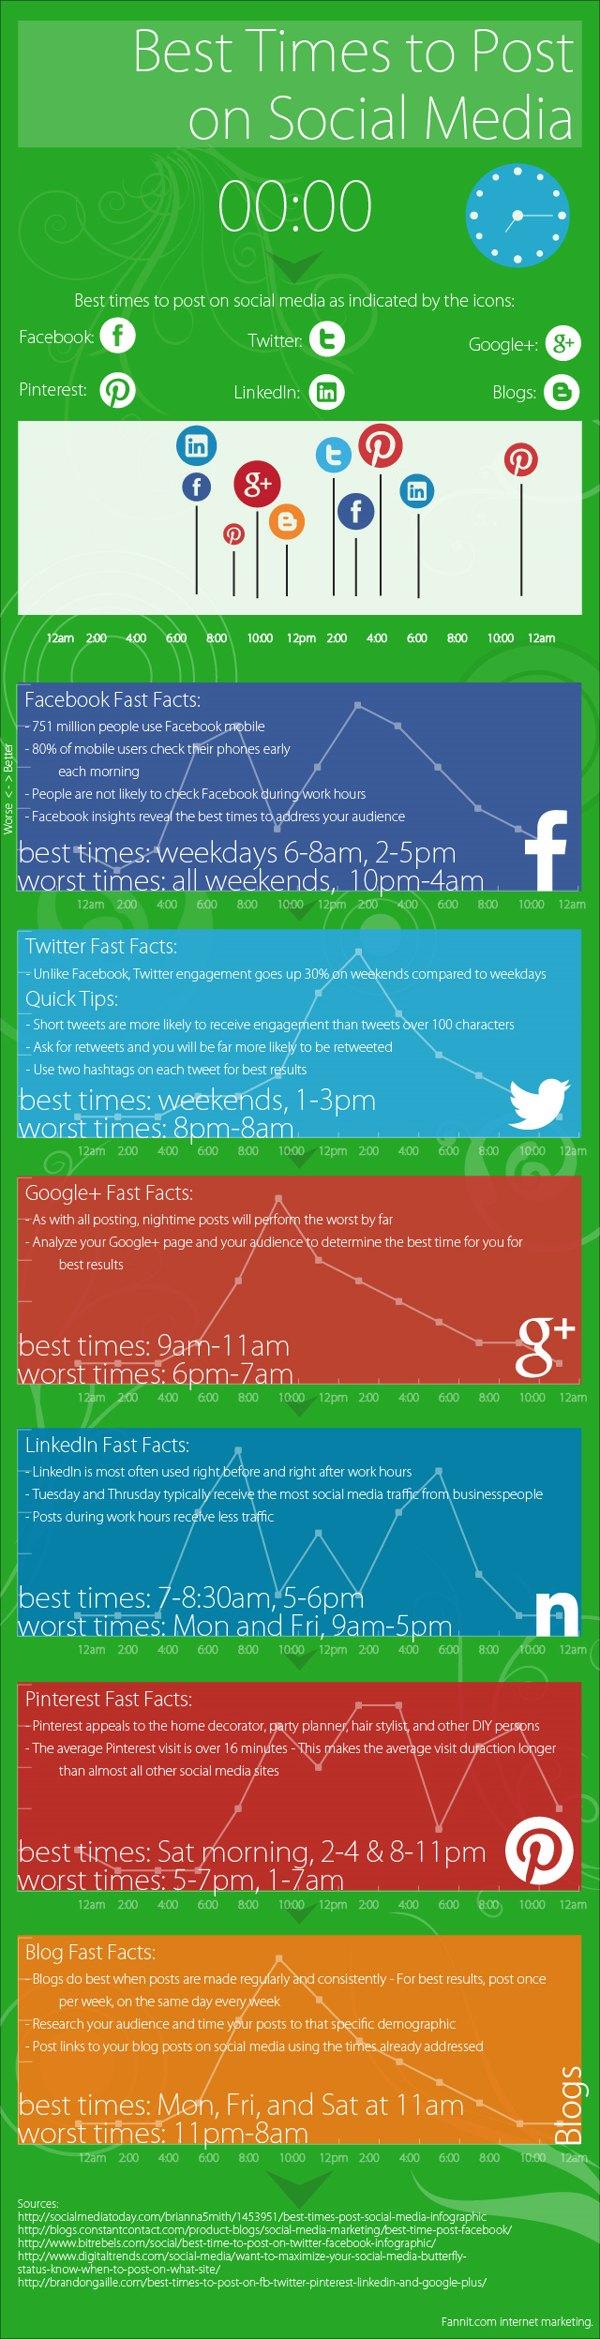 infografia mejor horario publicar twitter